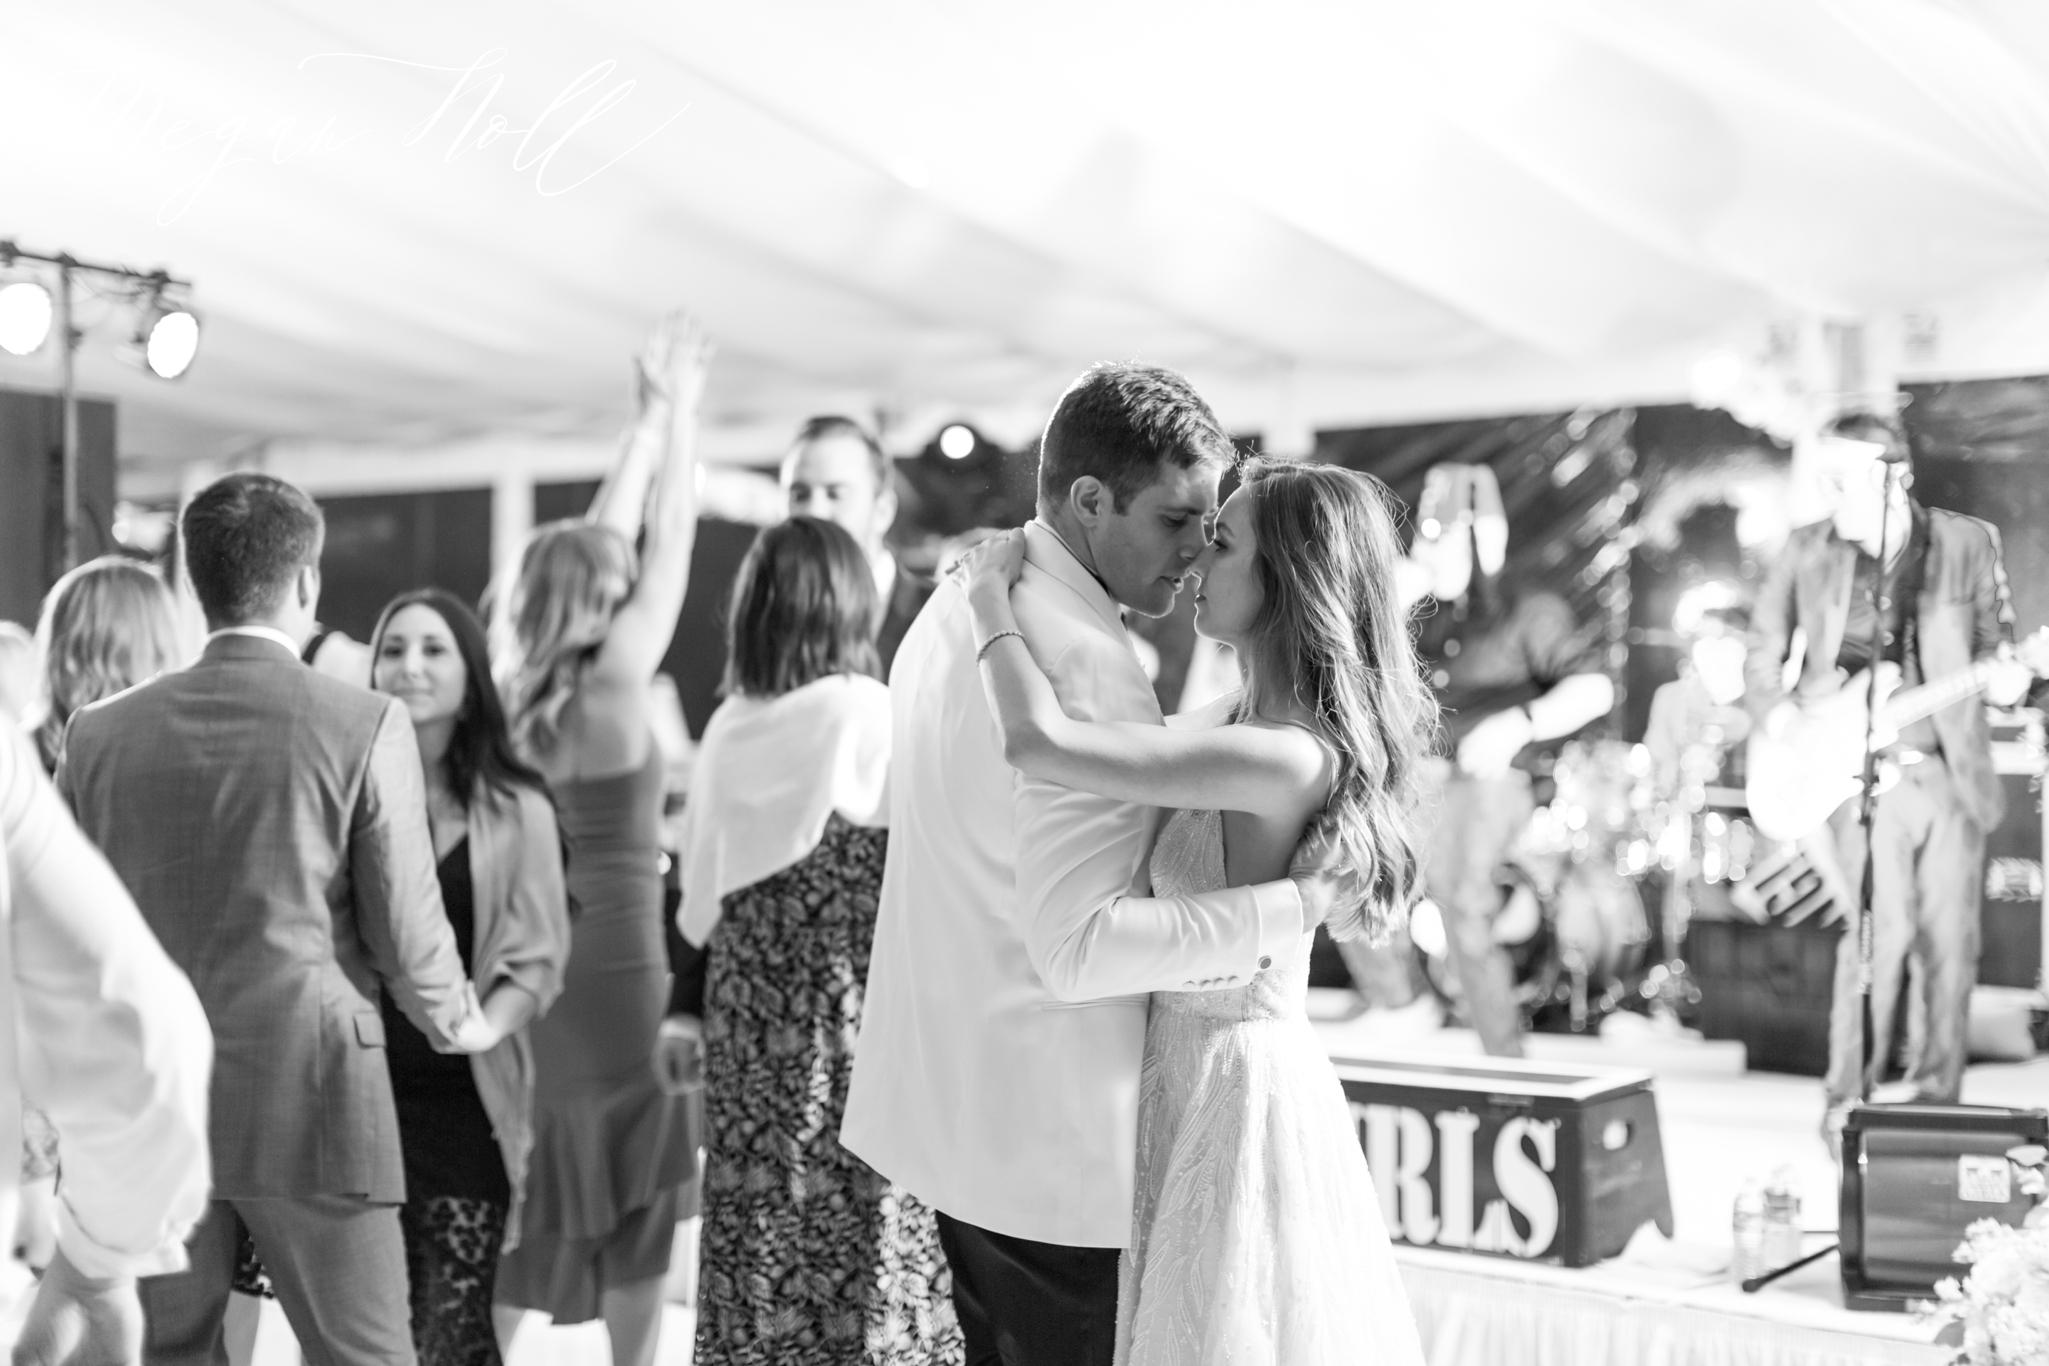 Bride and groom slow dancing together